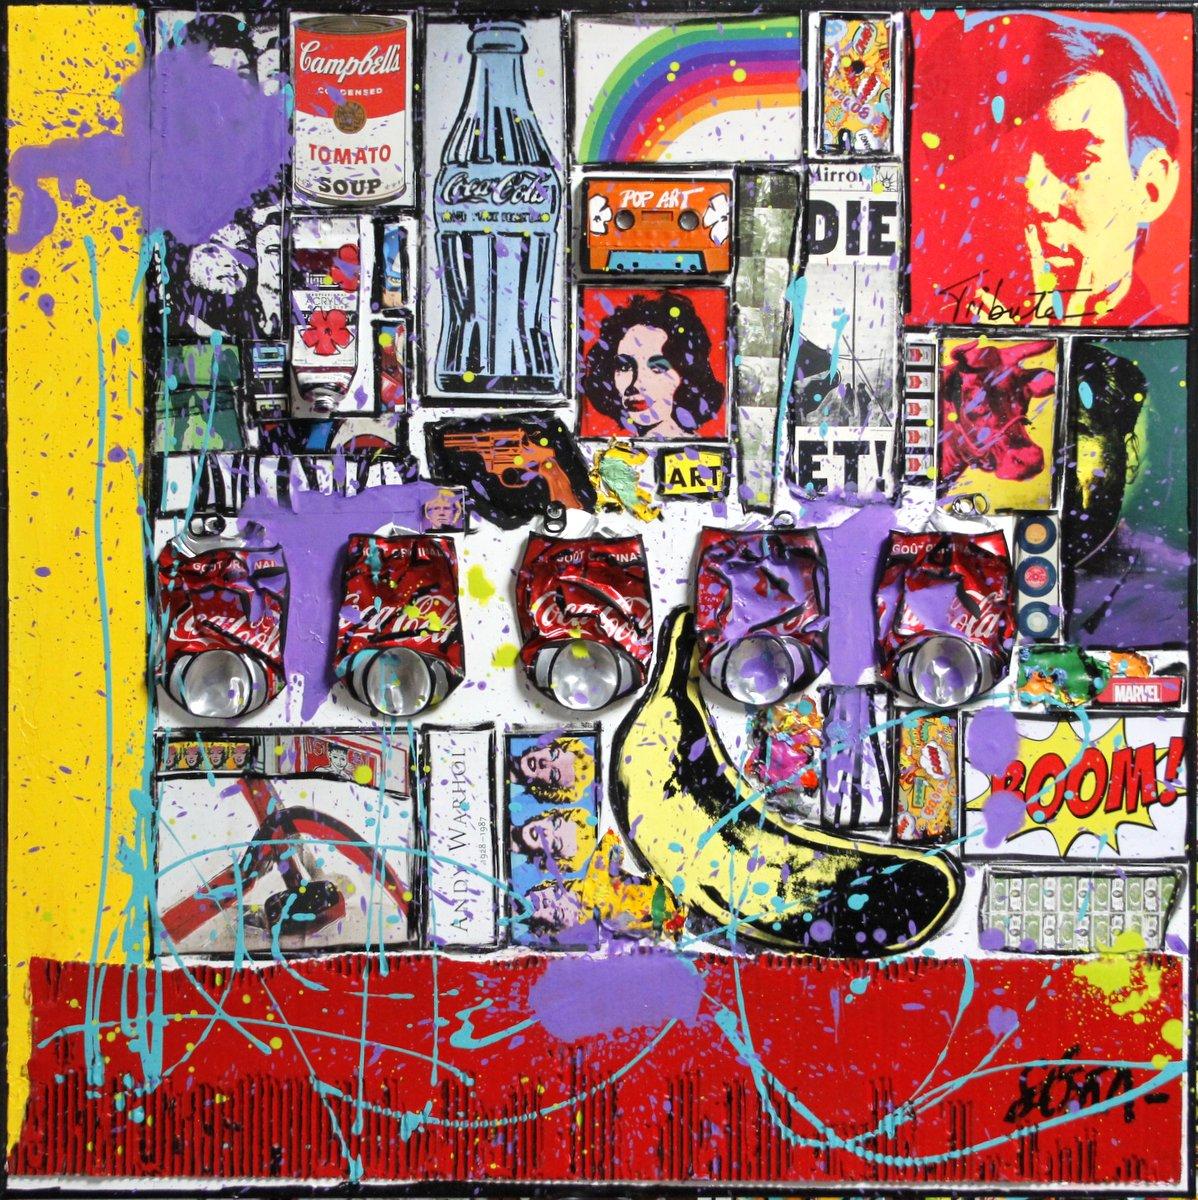 popart, warhol, collage Tableau Contemporain, Andy forever. Sophie Costa, artiste peintre.